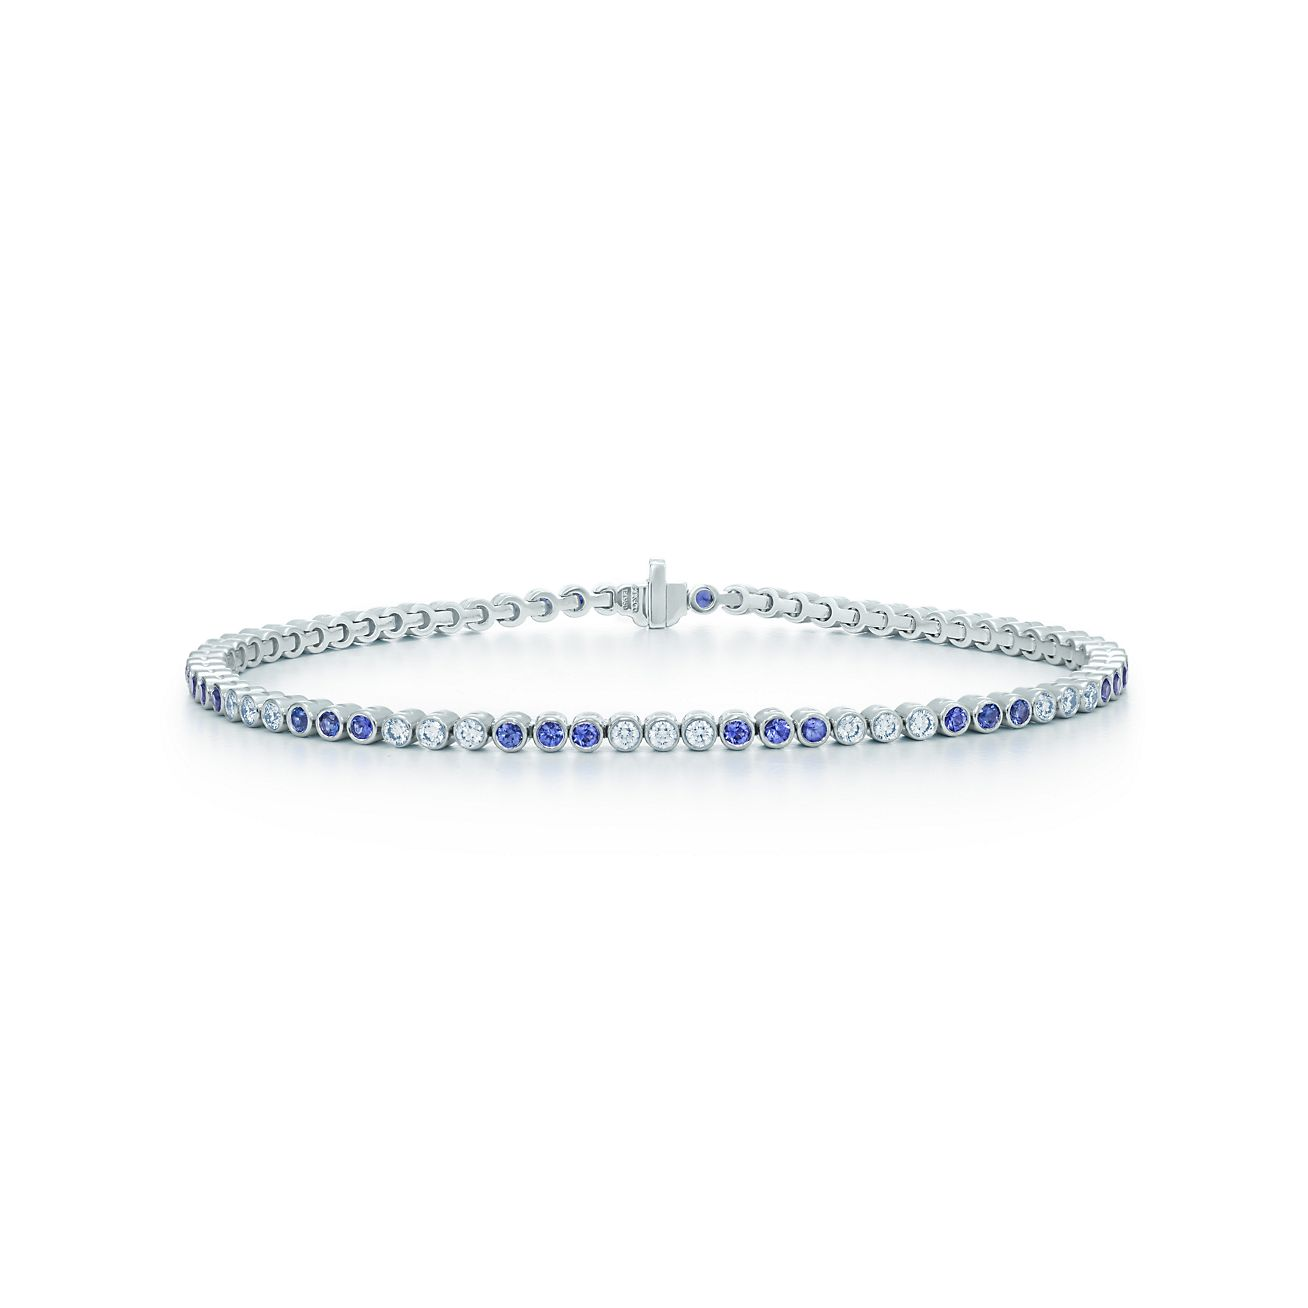 Tiffany Jazz Bracelet In Platinum With Diamonds And Sapphires Tiffany Co